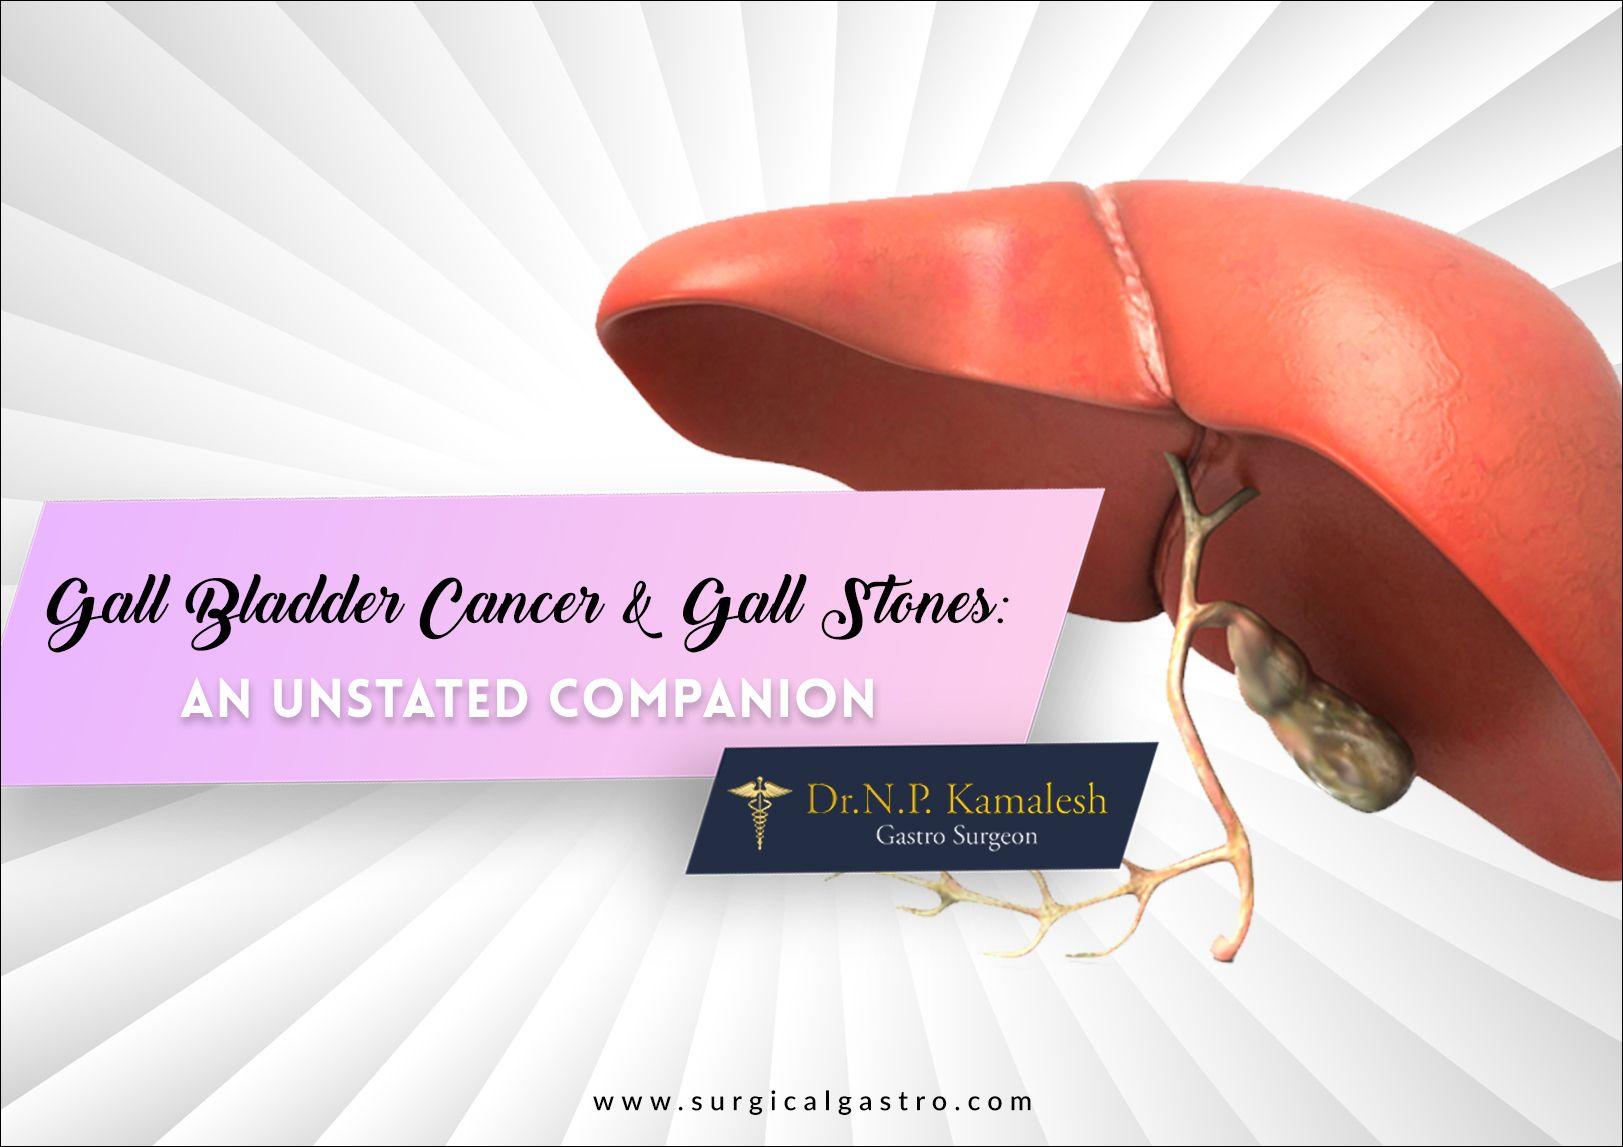 #gallbladder